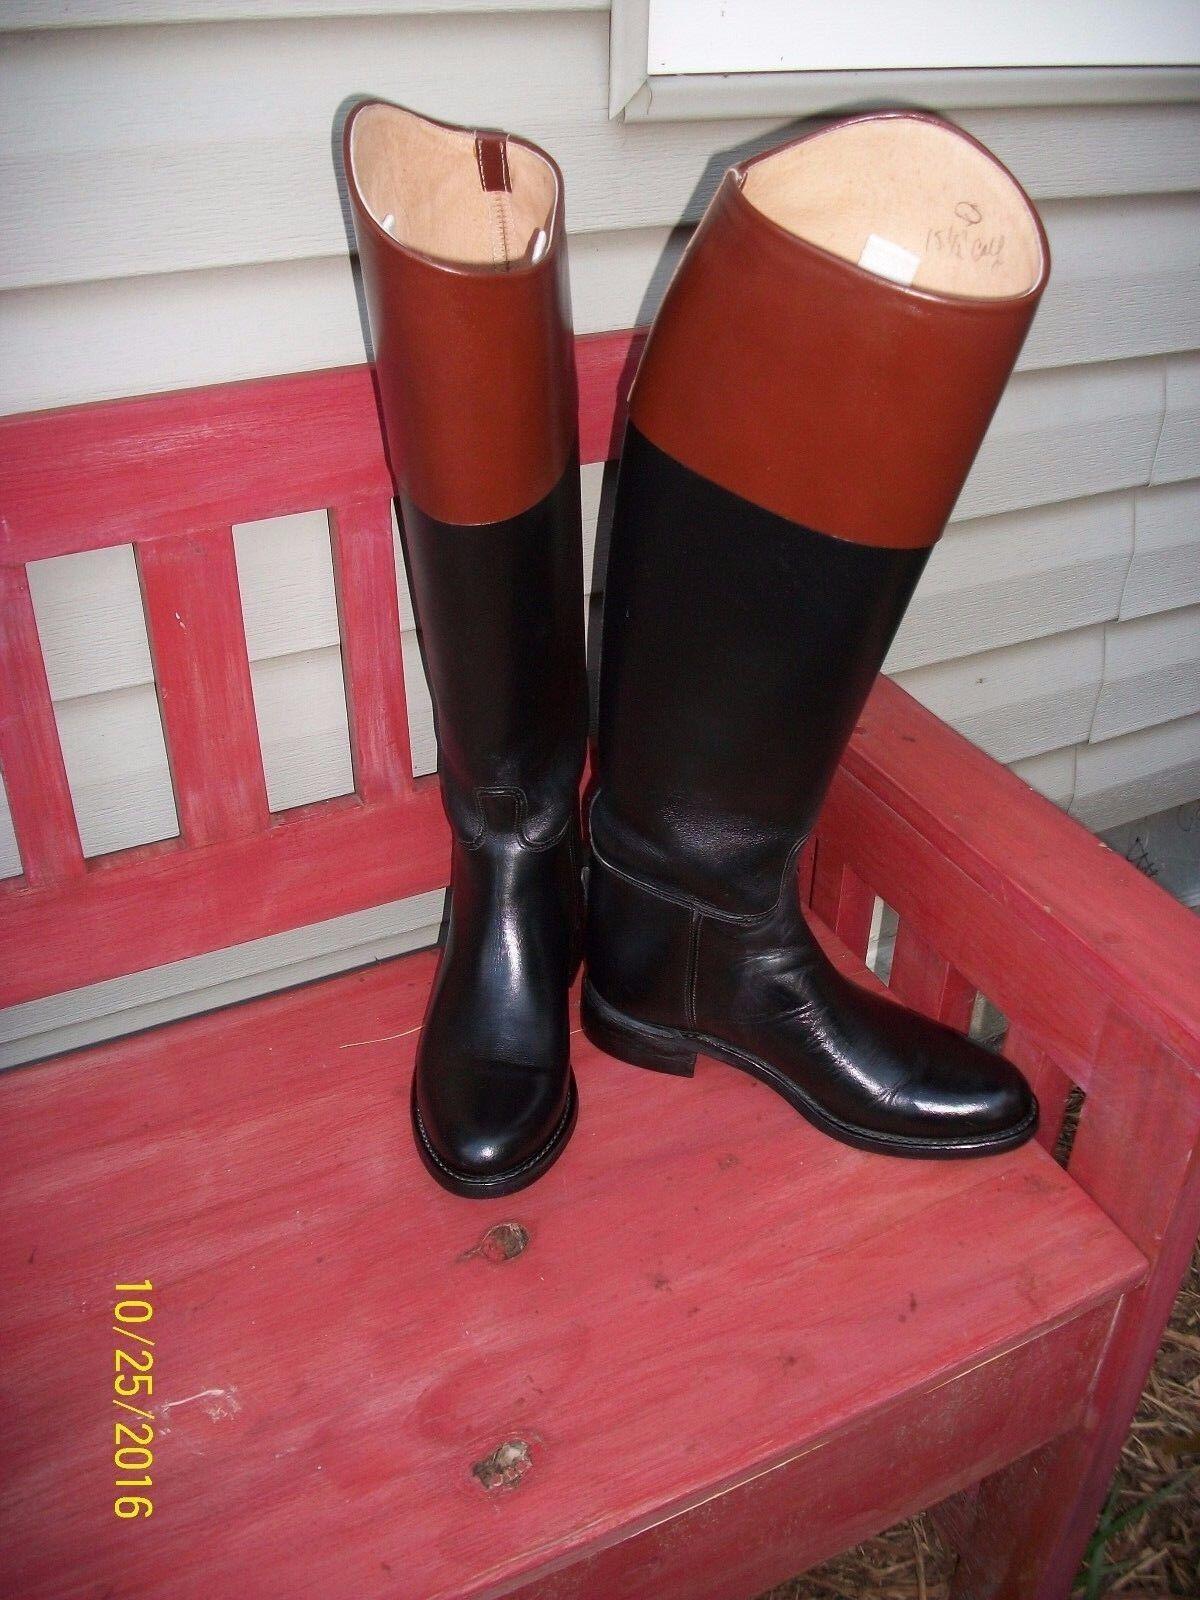 WOMEN'S BOND BOND BOND EFFINGHAM 20   TALL BLACK & BROWN RIDING AND OR FASHION BOOTS 6.5 82467e